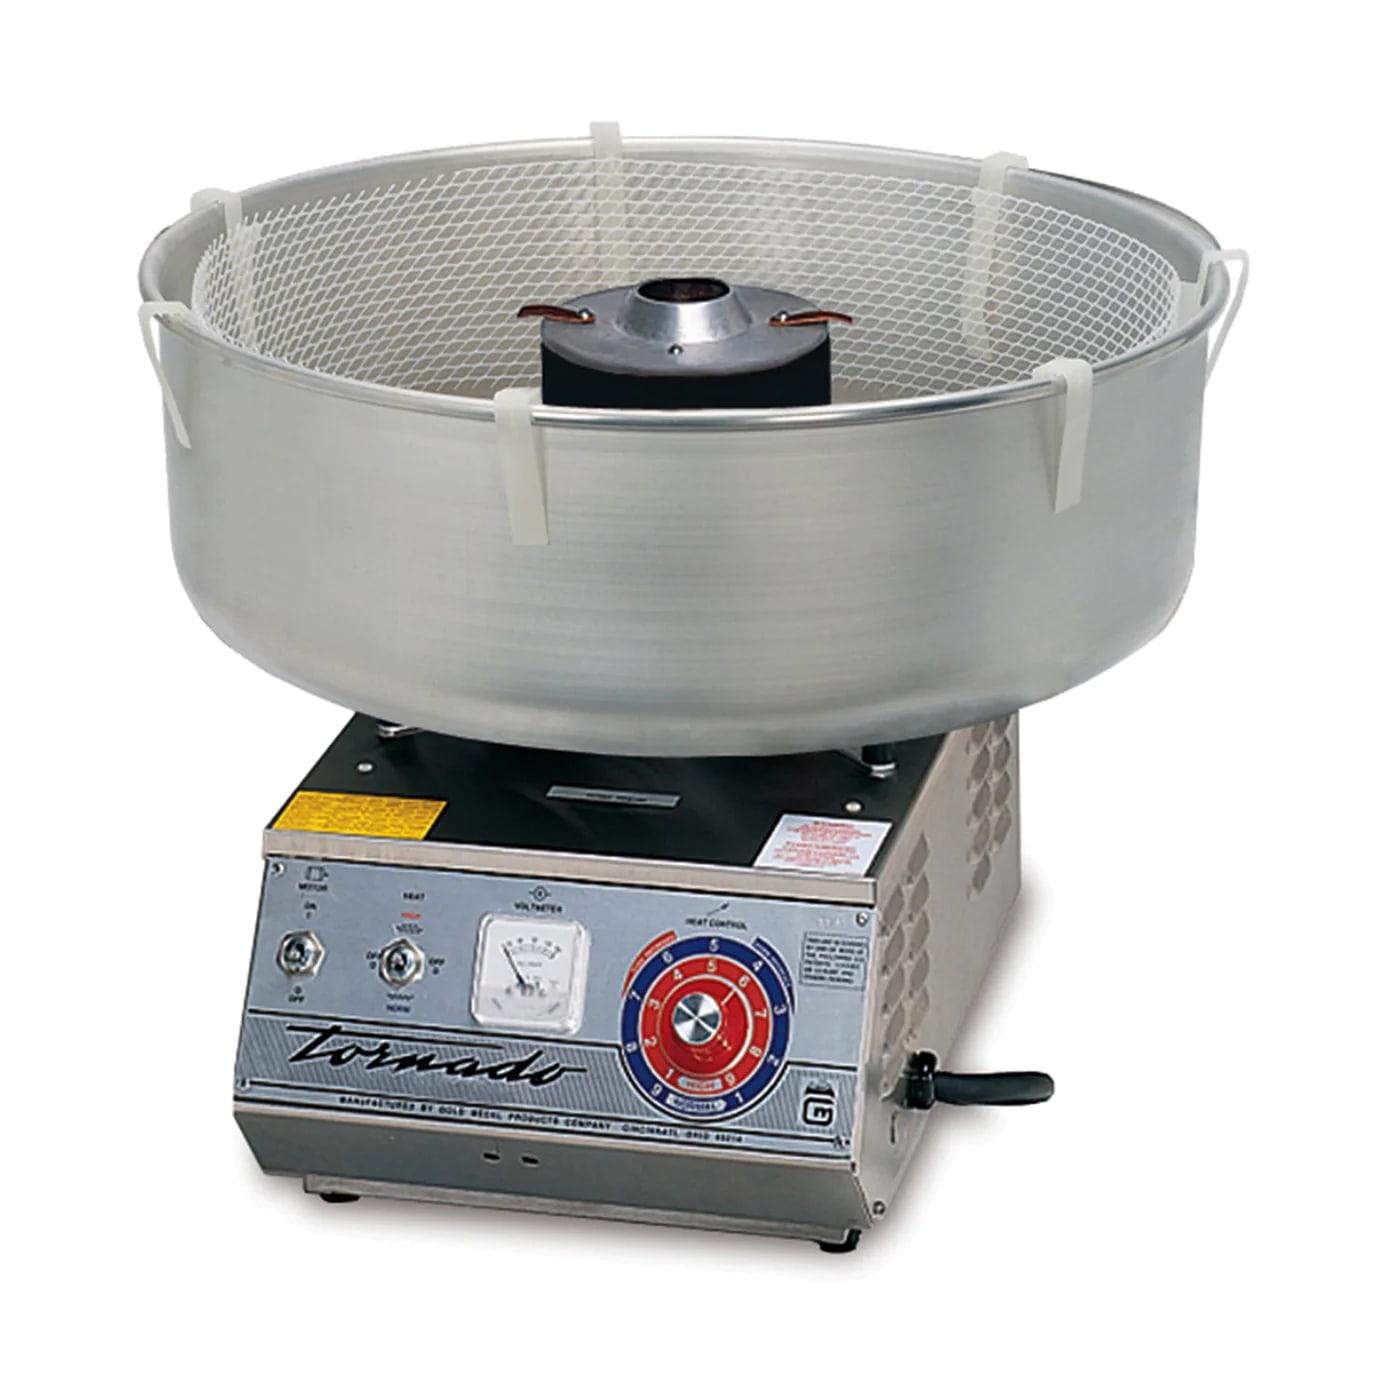 Gold Medal 3007 High Output Tornado Floss Cotton Candy Machine w/ Aluminum Floss Bowl, 120v